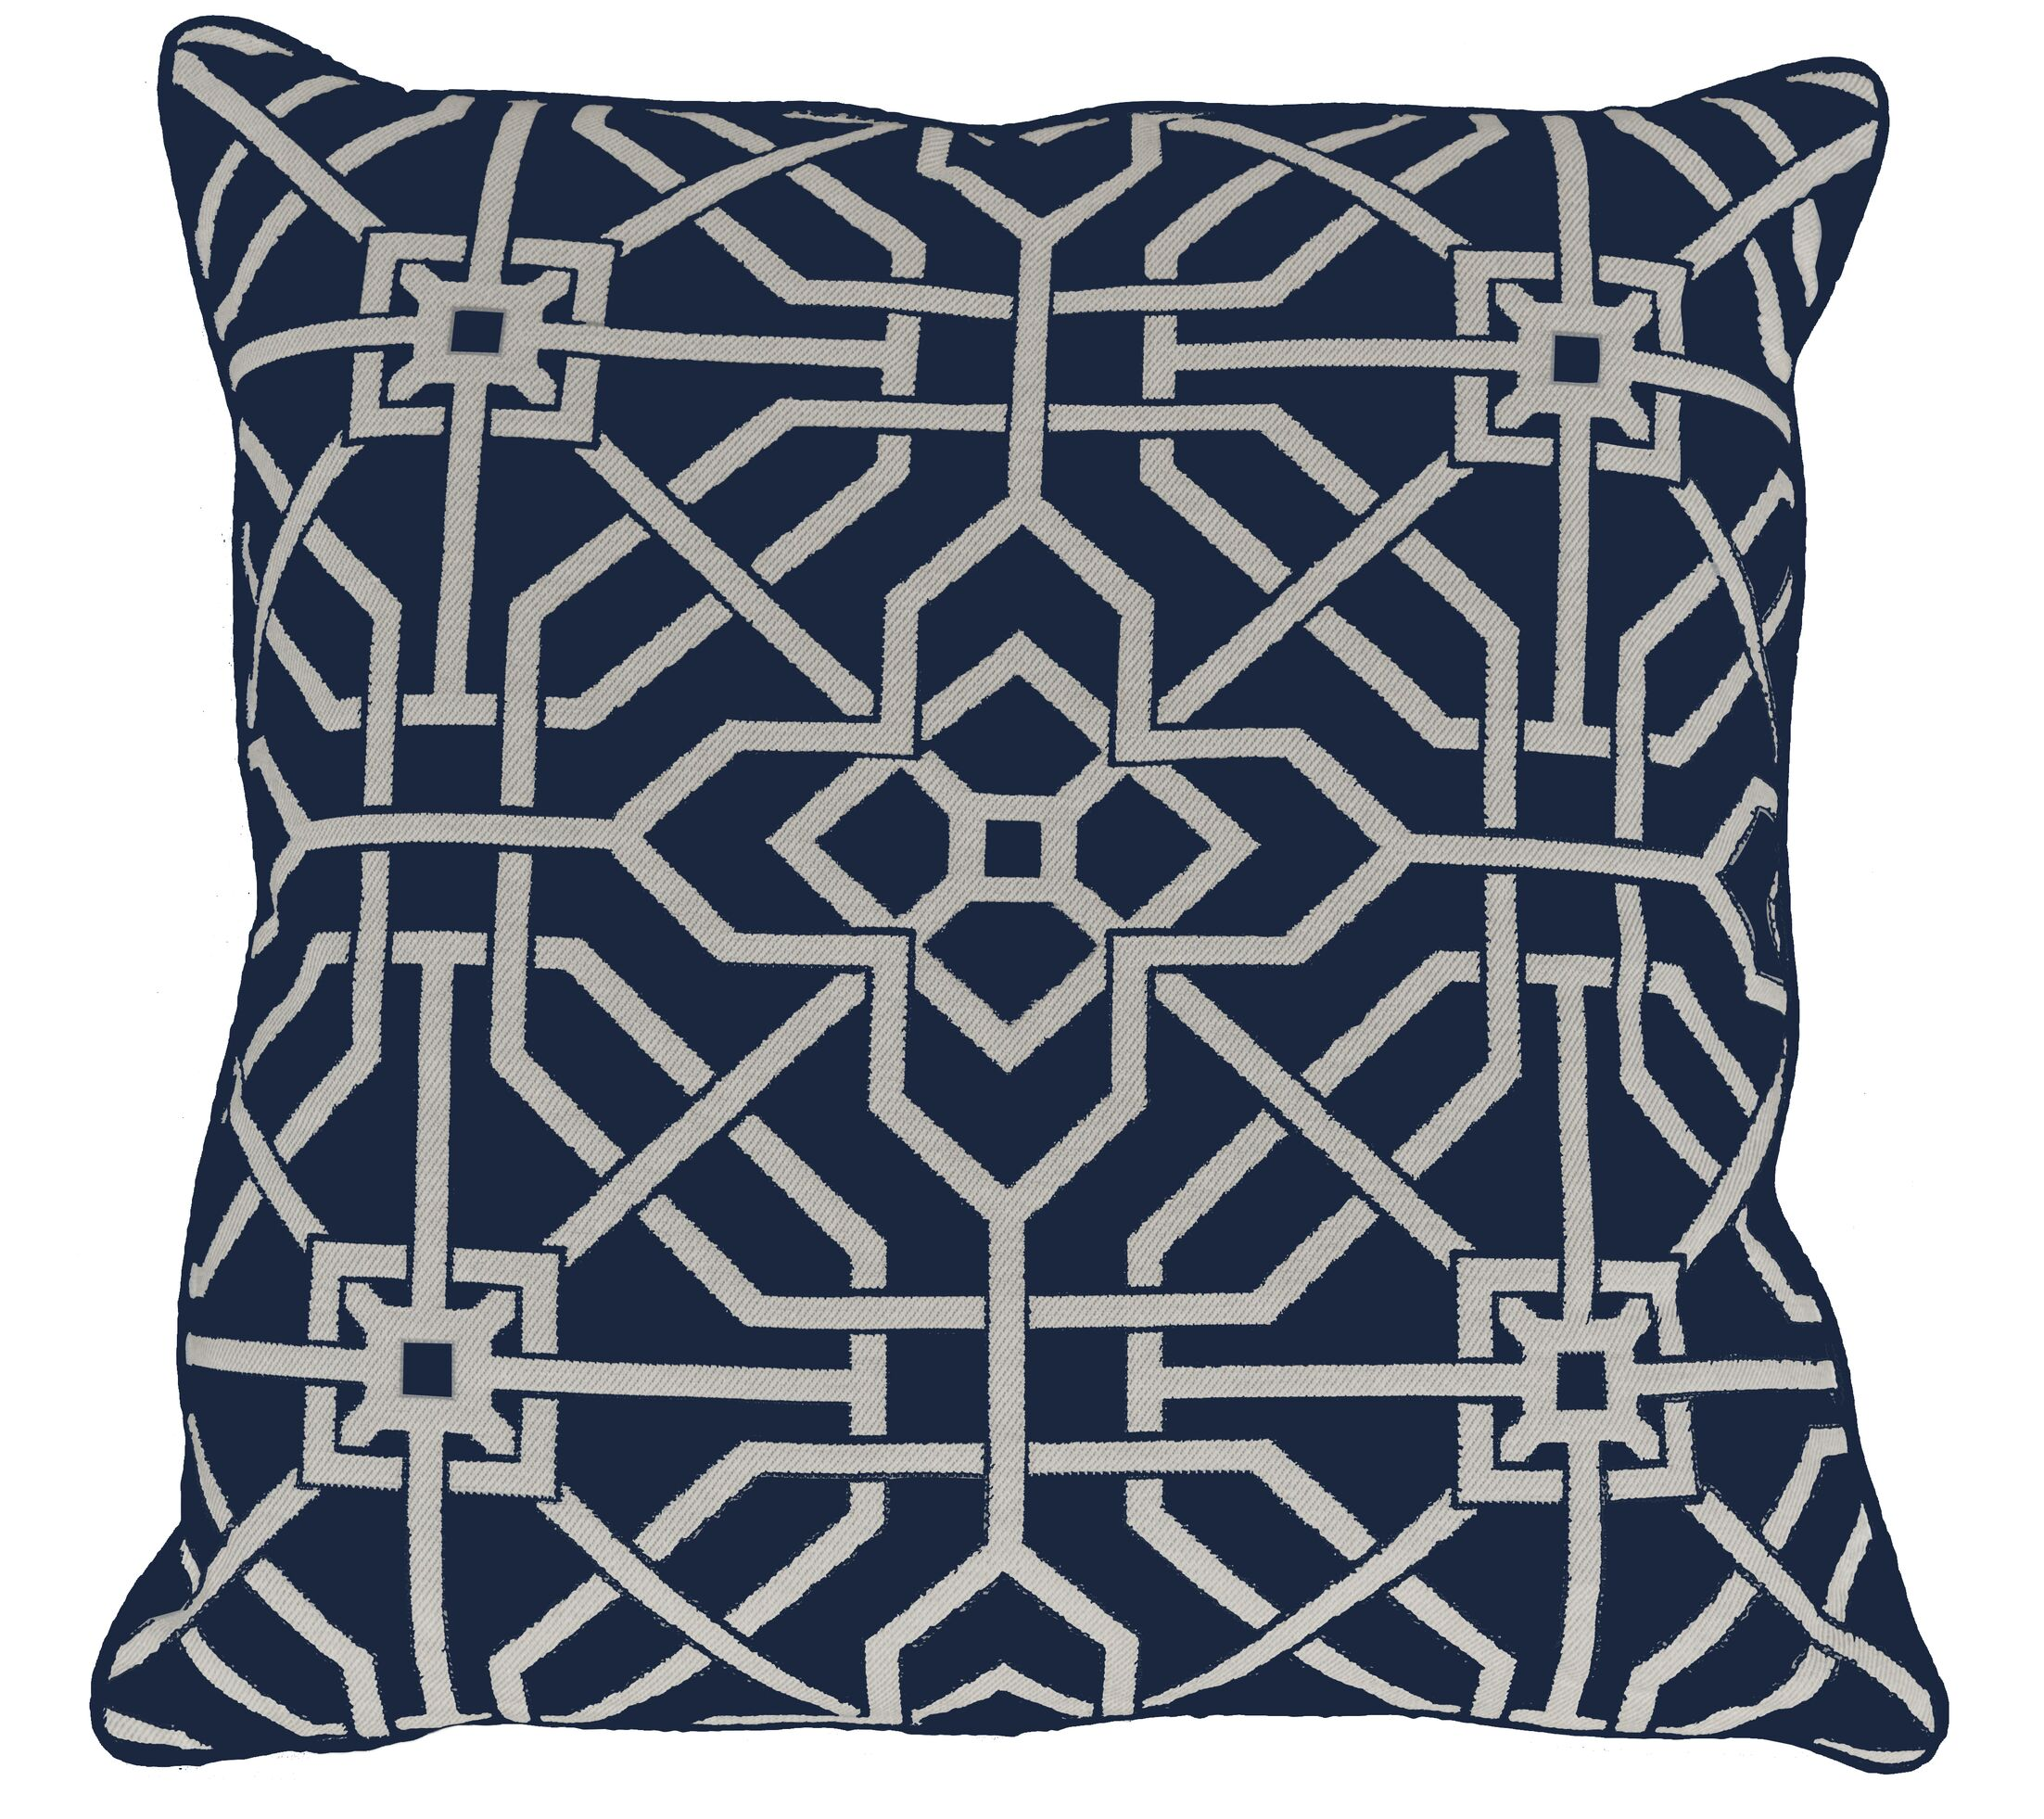 Port Palace Indoor/Outdoor Throw Pillow (Set of 2) Color: Indigo, Size: 22